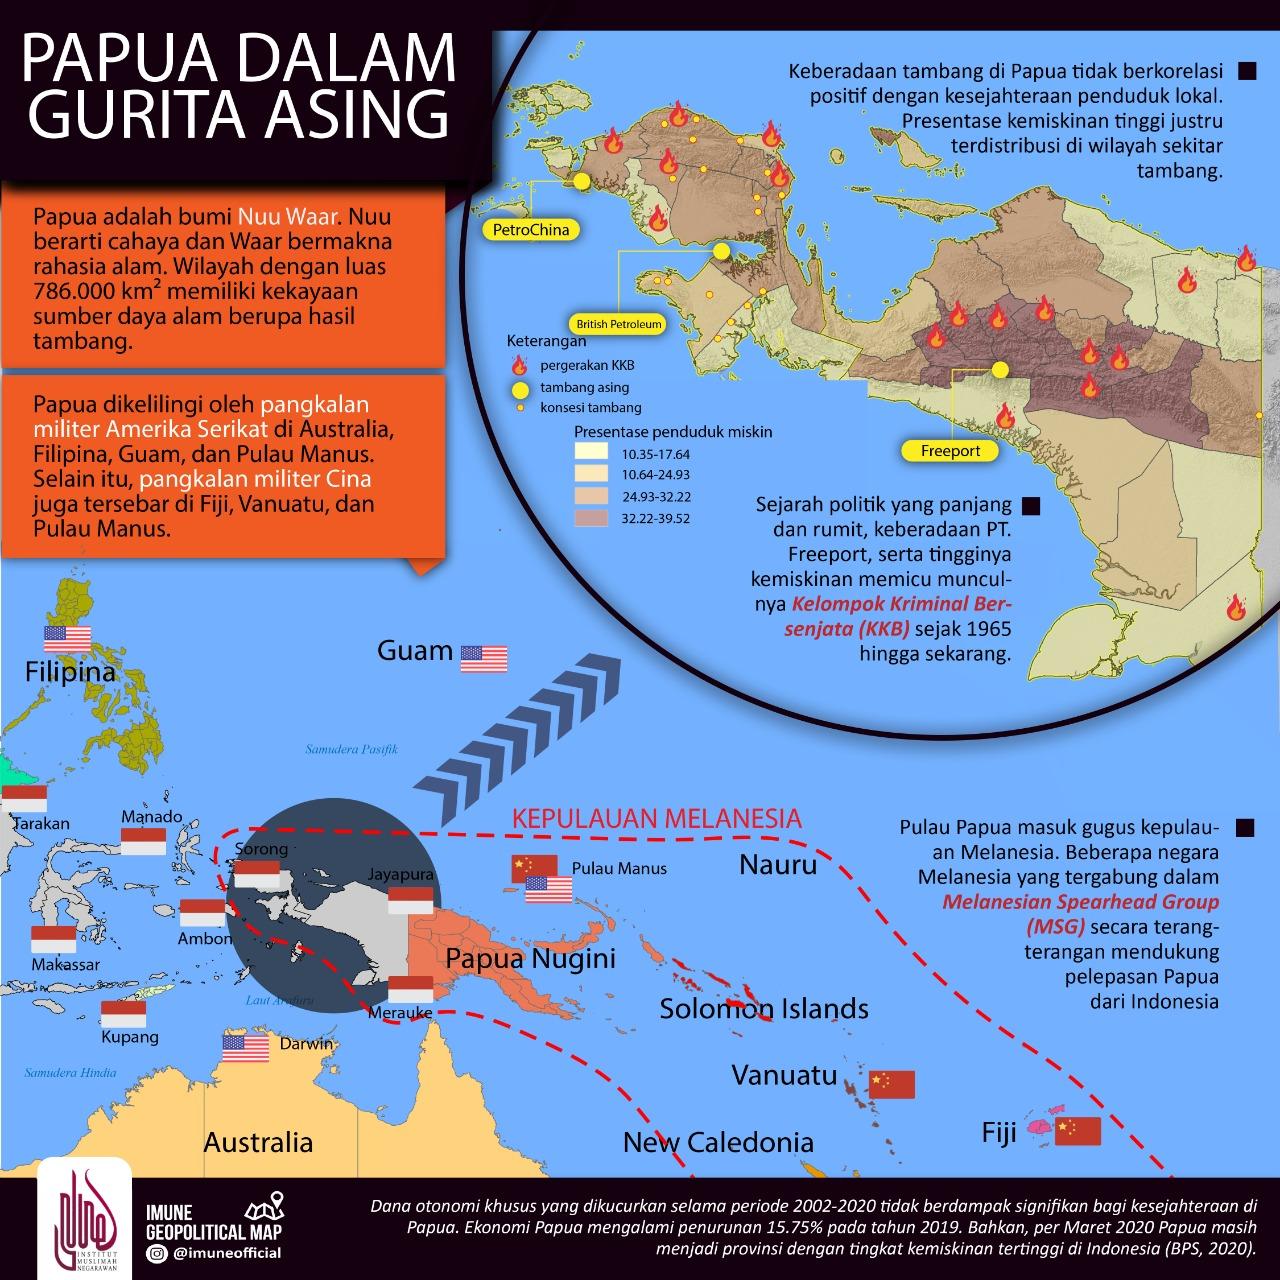 Papua dalam Gurita Asing